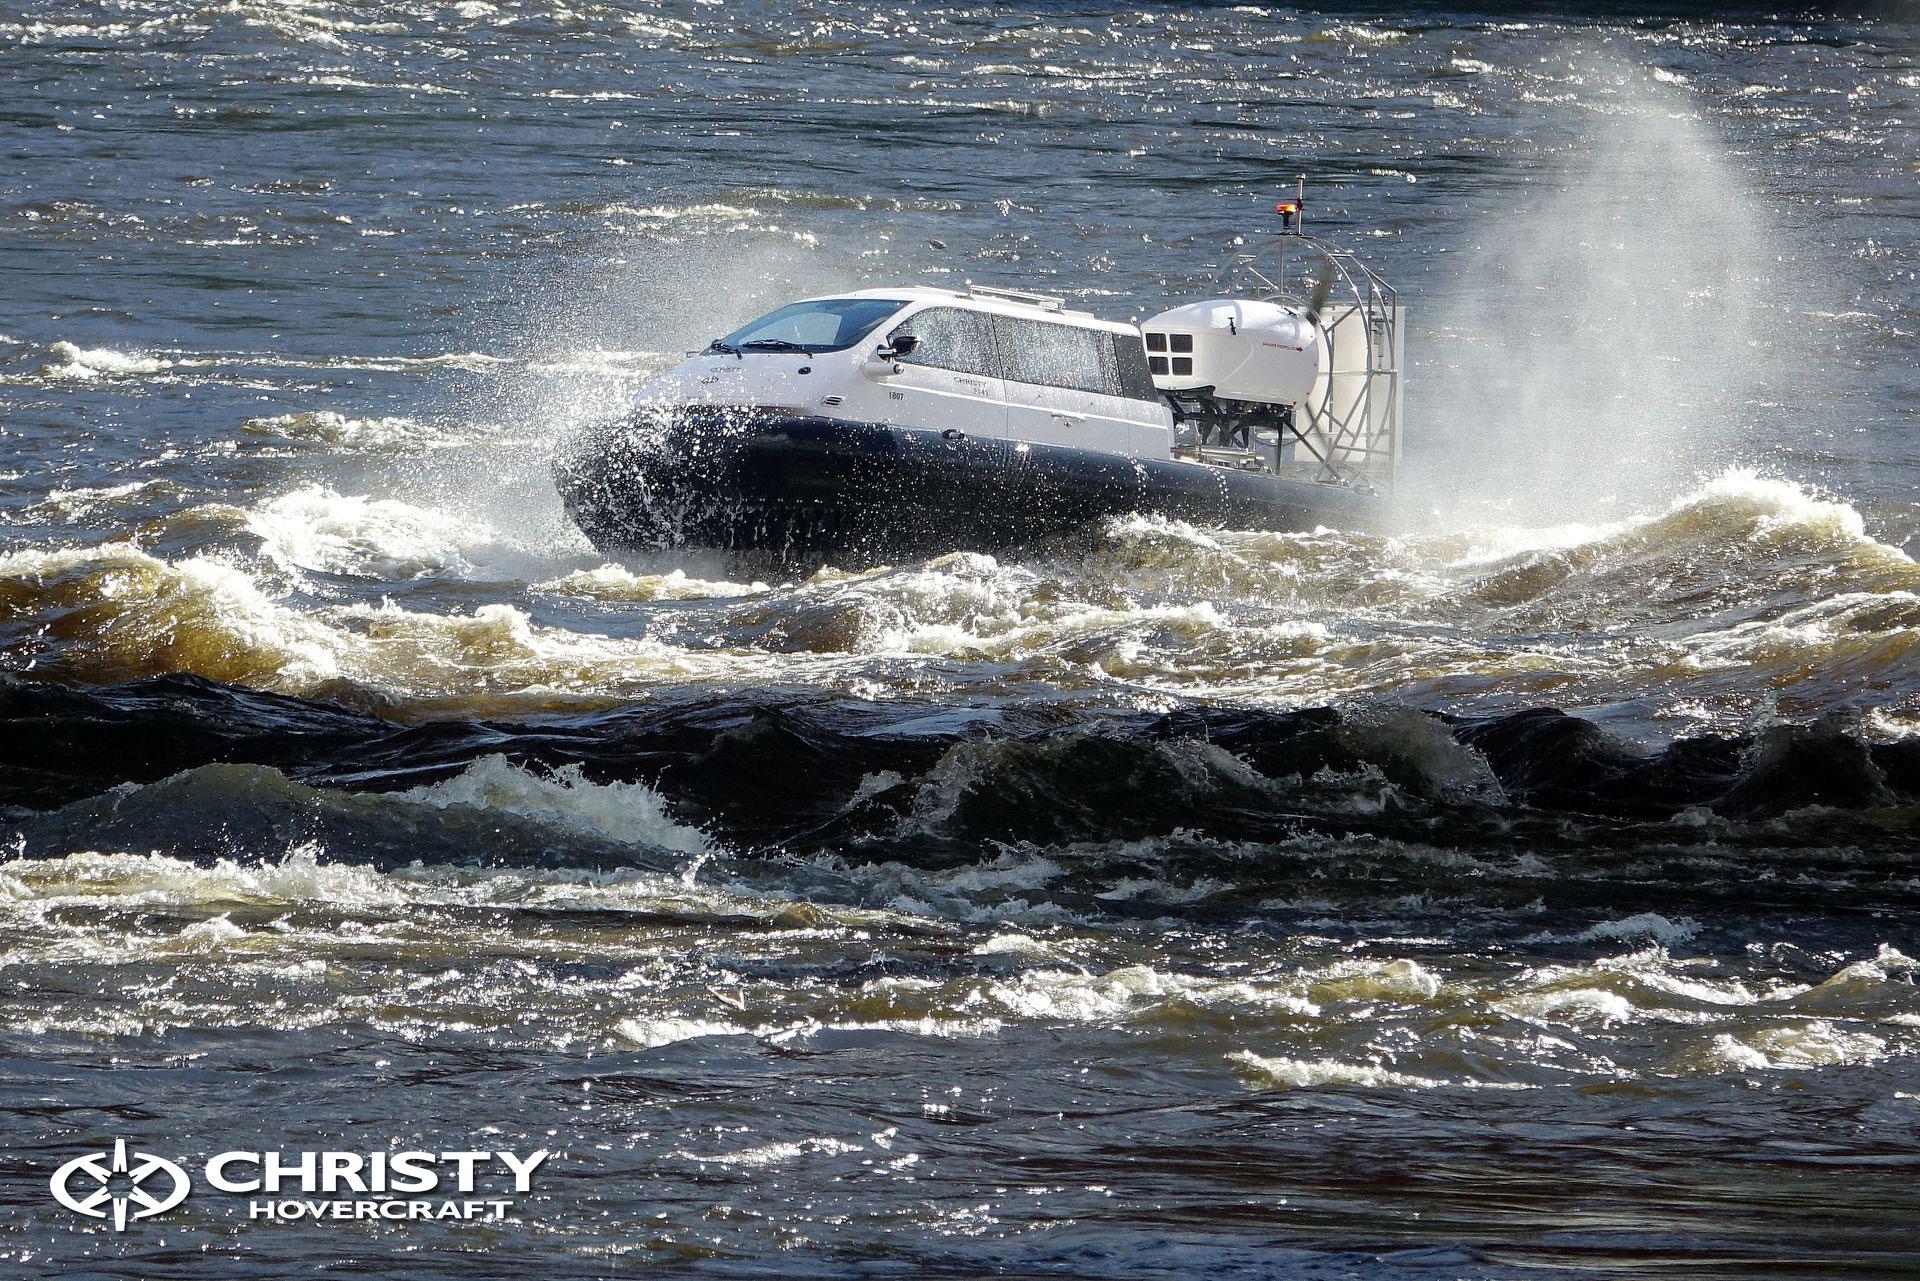 Hovercraft-Christy-5146-FC-24.jpg | фото №22